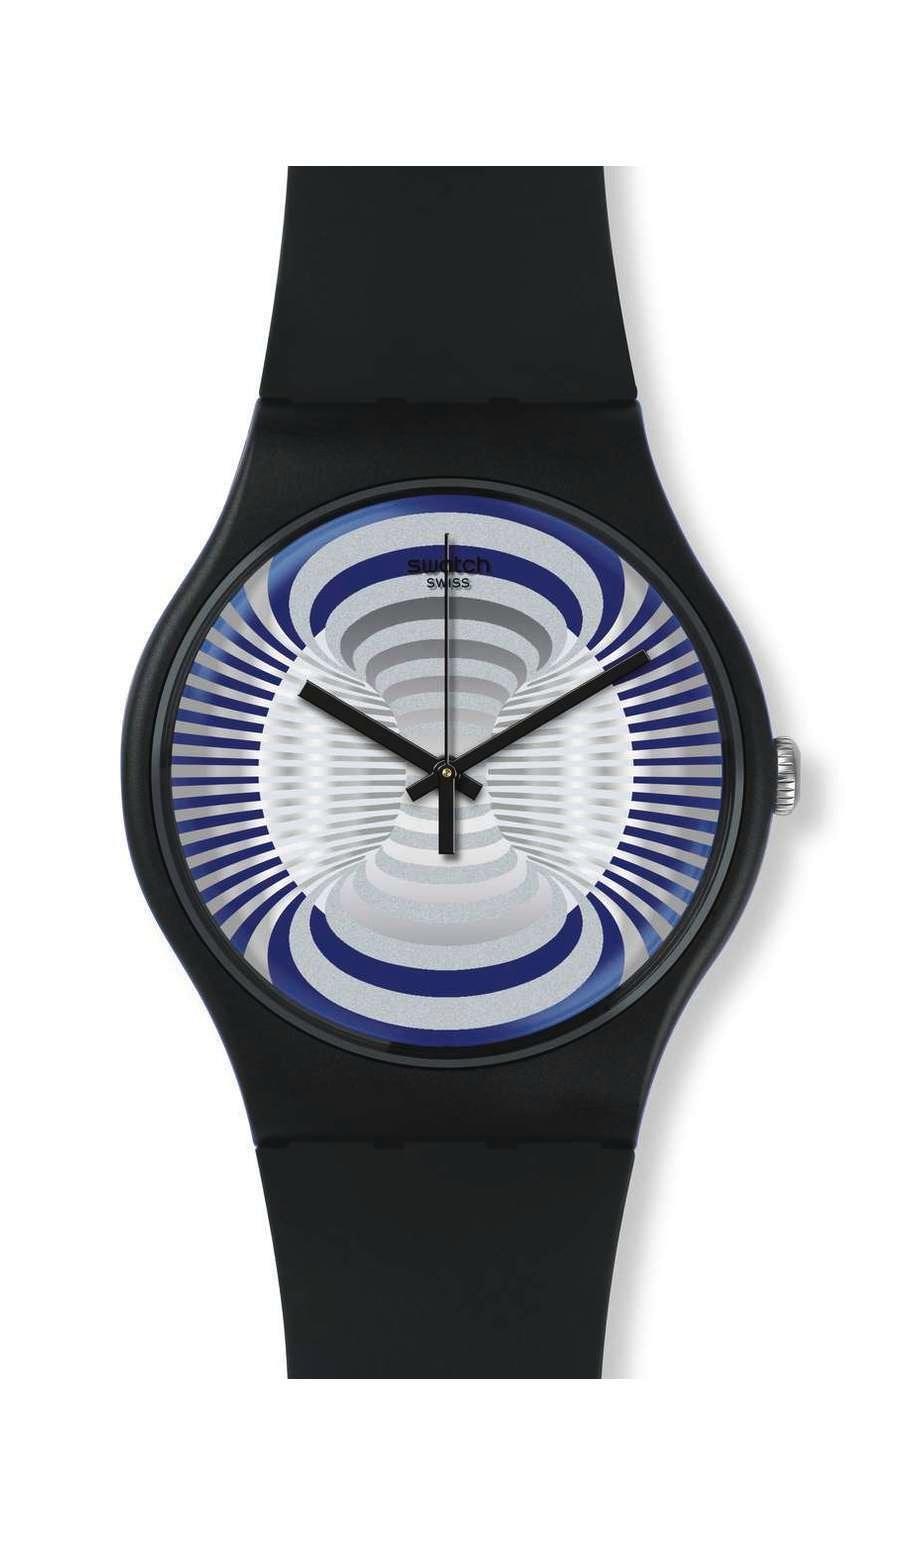 Swatch - MICROSILLON - 1